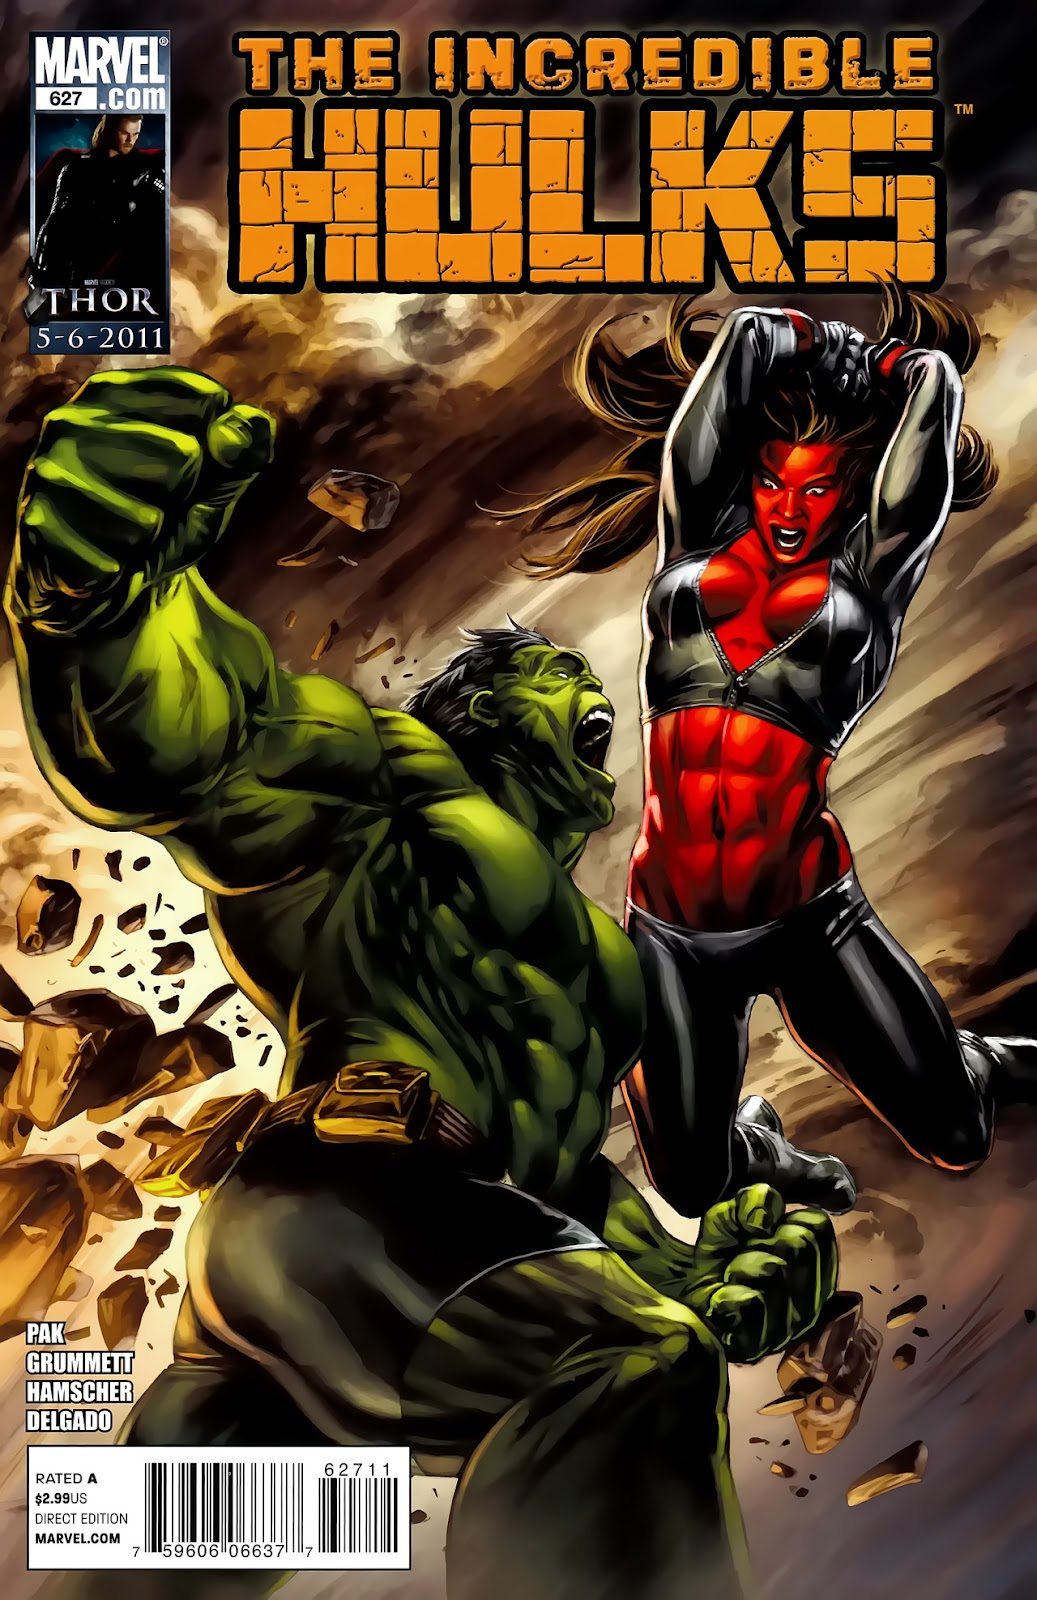 Incredible Hulks (2010) Issue #627 #17 - English 1